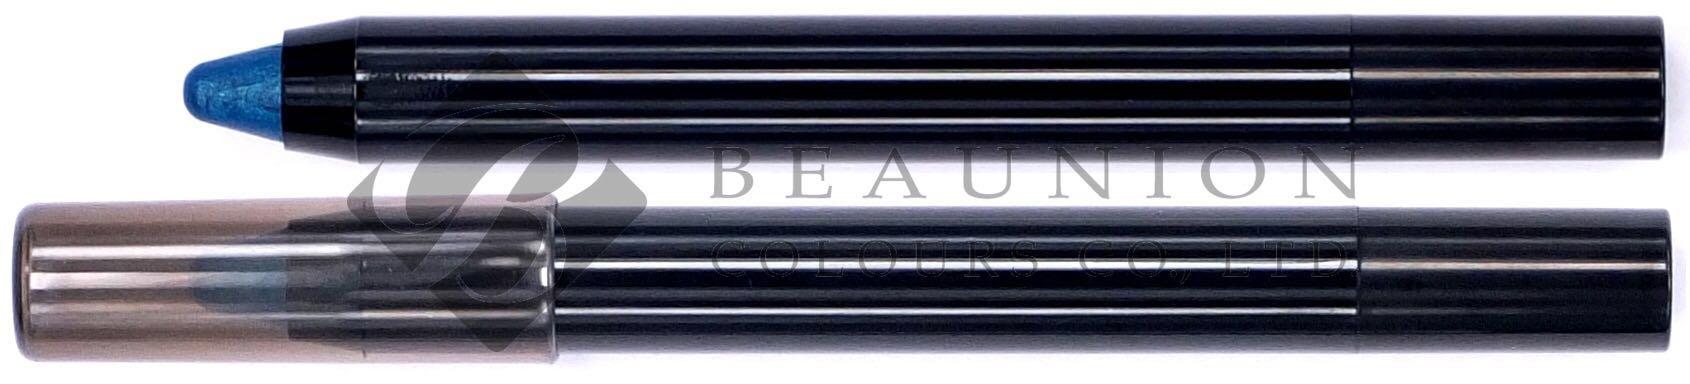 RA-006 Eye Shadow Pencil / lipstick